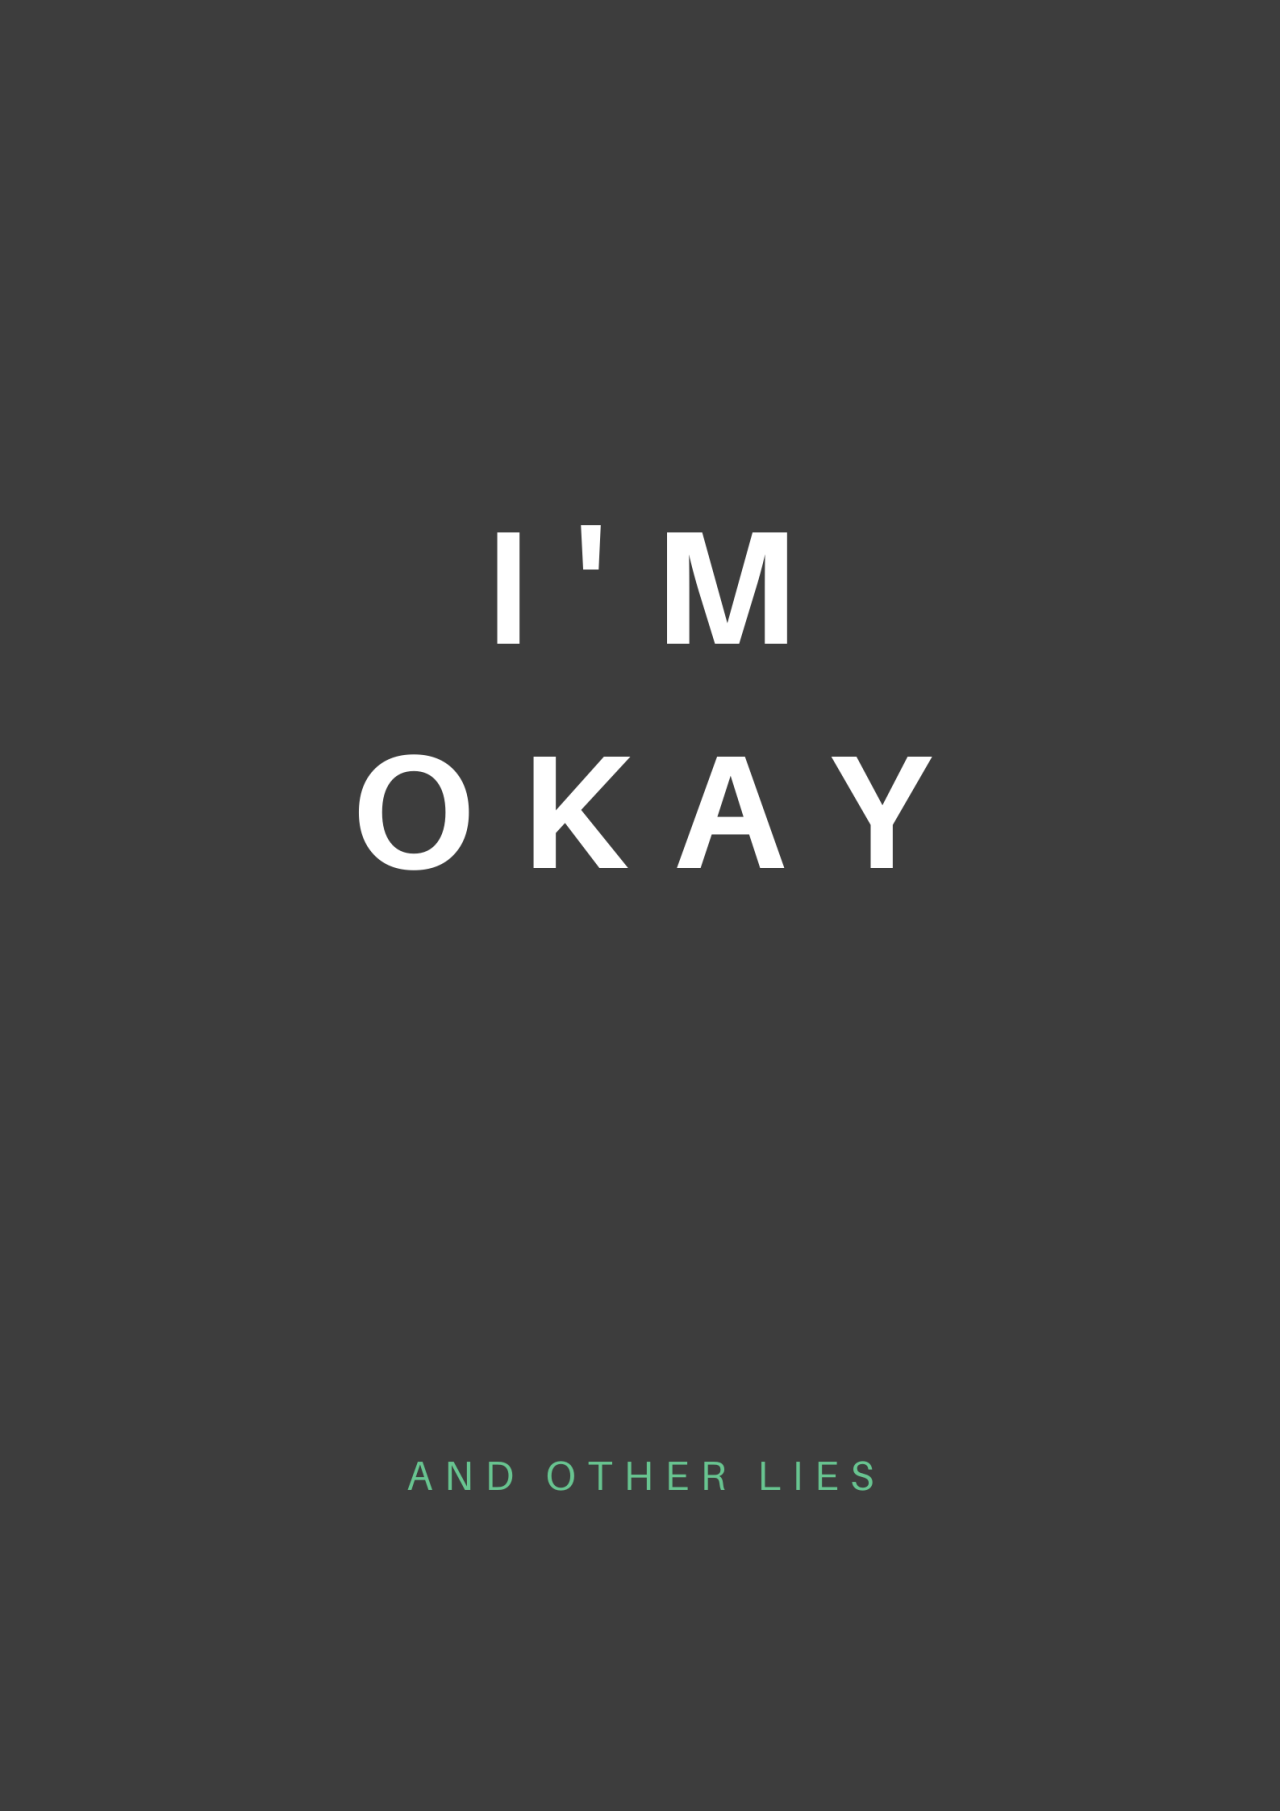 #sad#sad quotes#lies#quote#quotes#love#mentally ill#depressed#sad life#life#black#black aesthetic#dark#Typography#follow#like#reblog#relate#poem#poet#poetic#shit